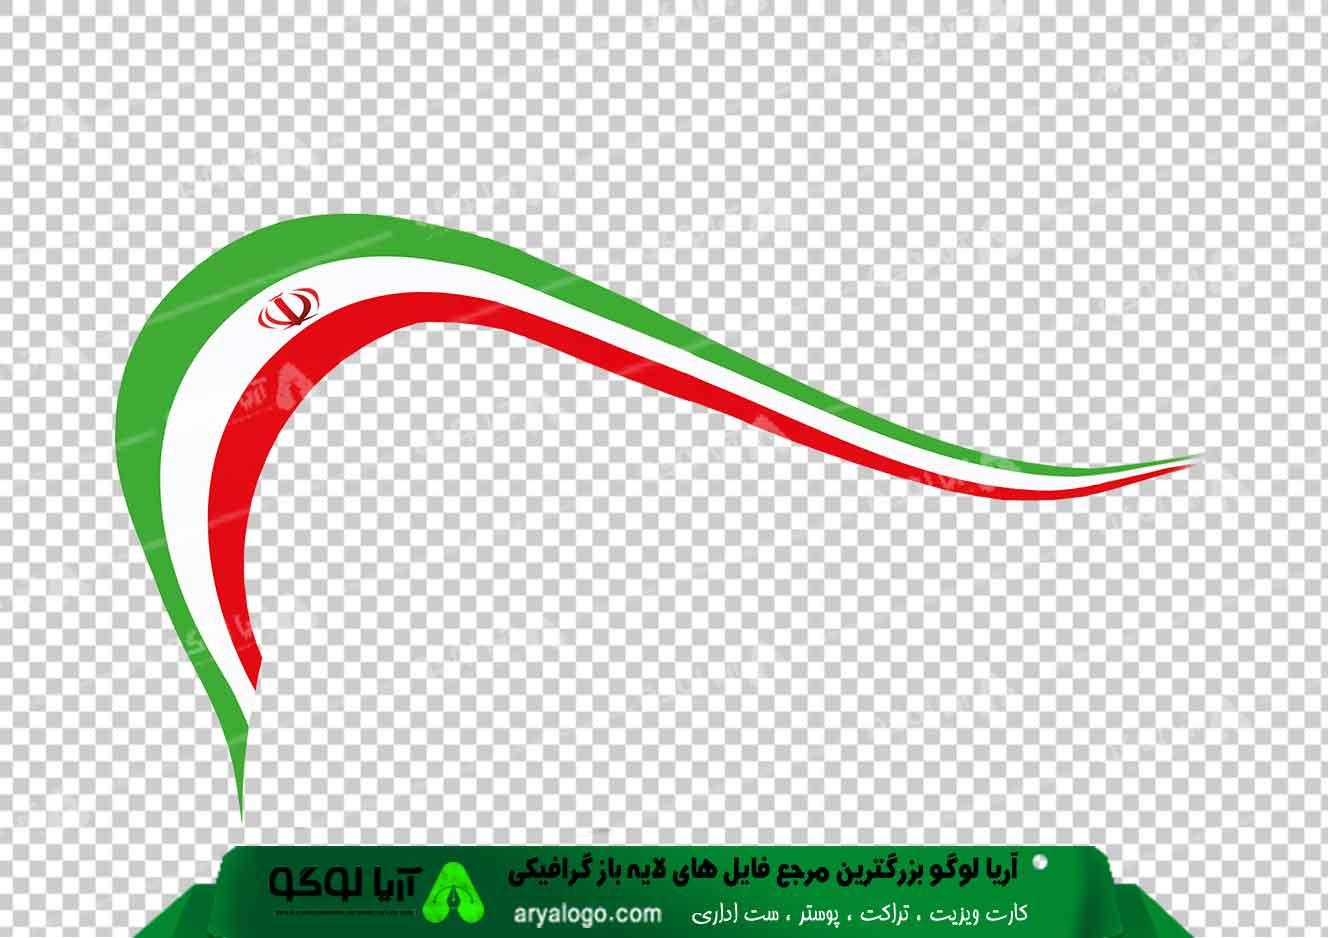 وکتور png پرچم ایران 14